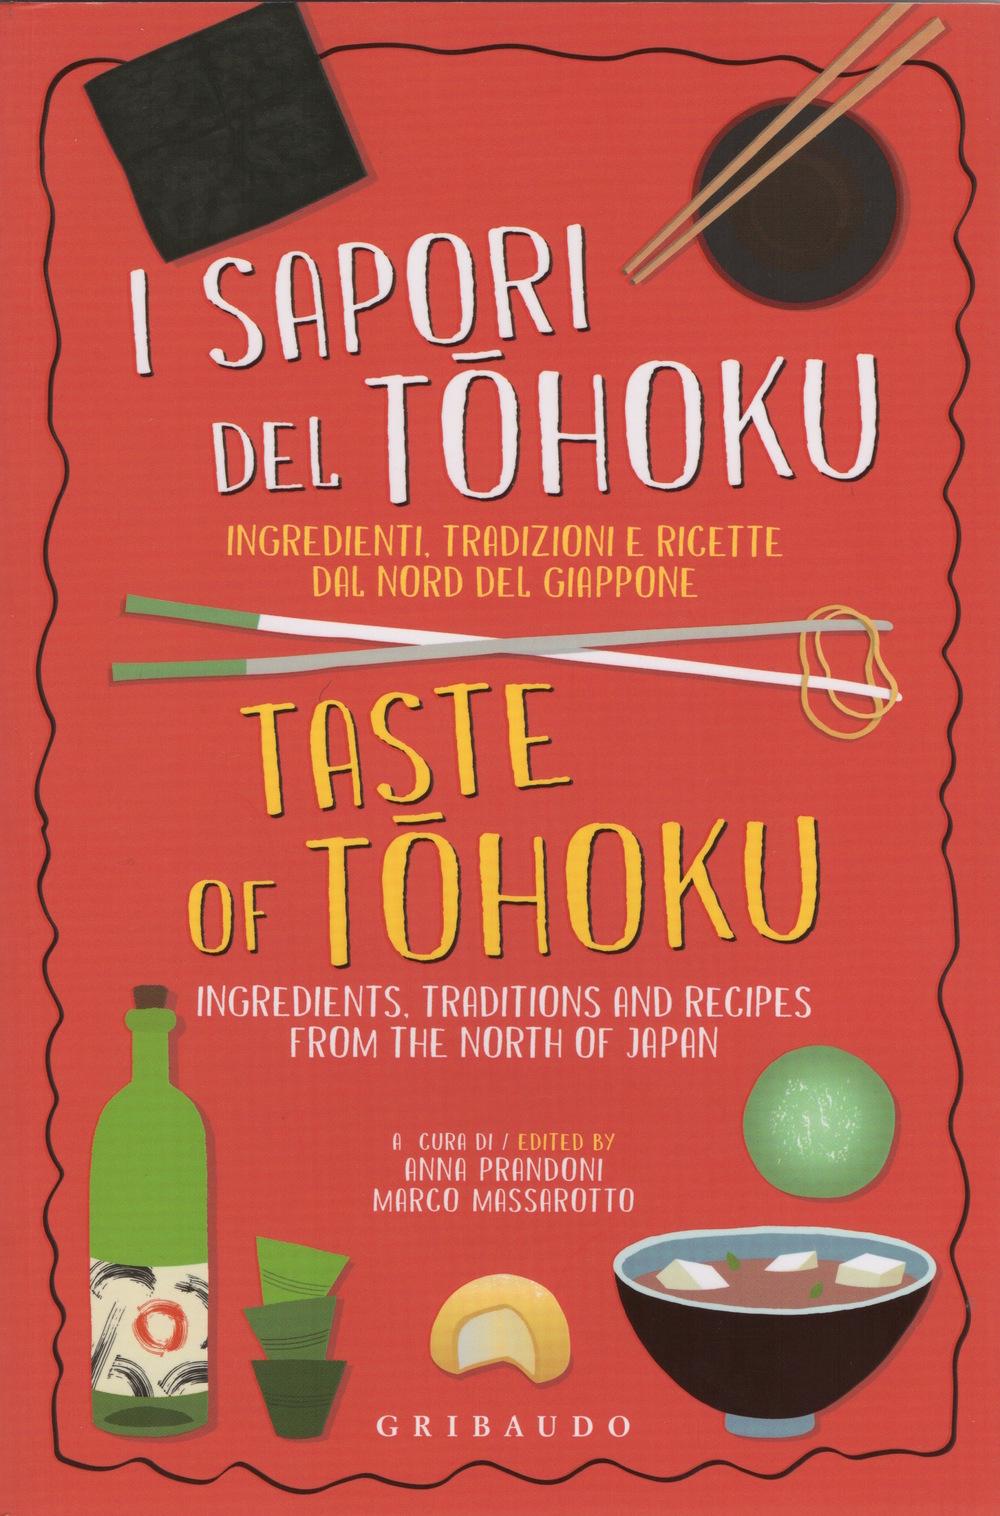 Taste of Tohoku cookbook